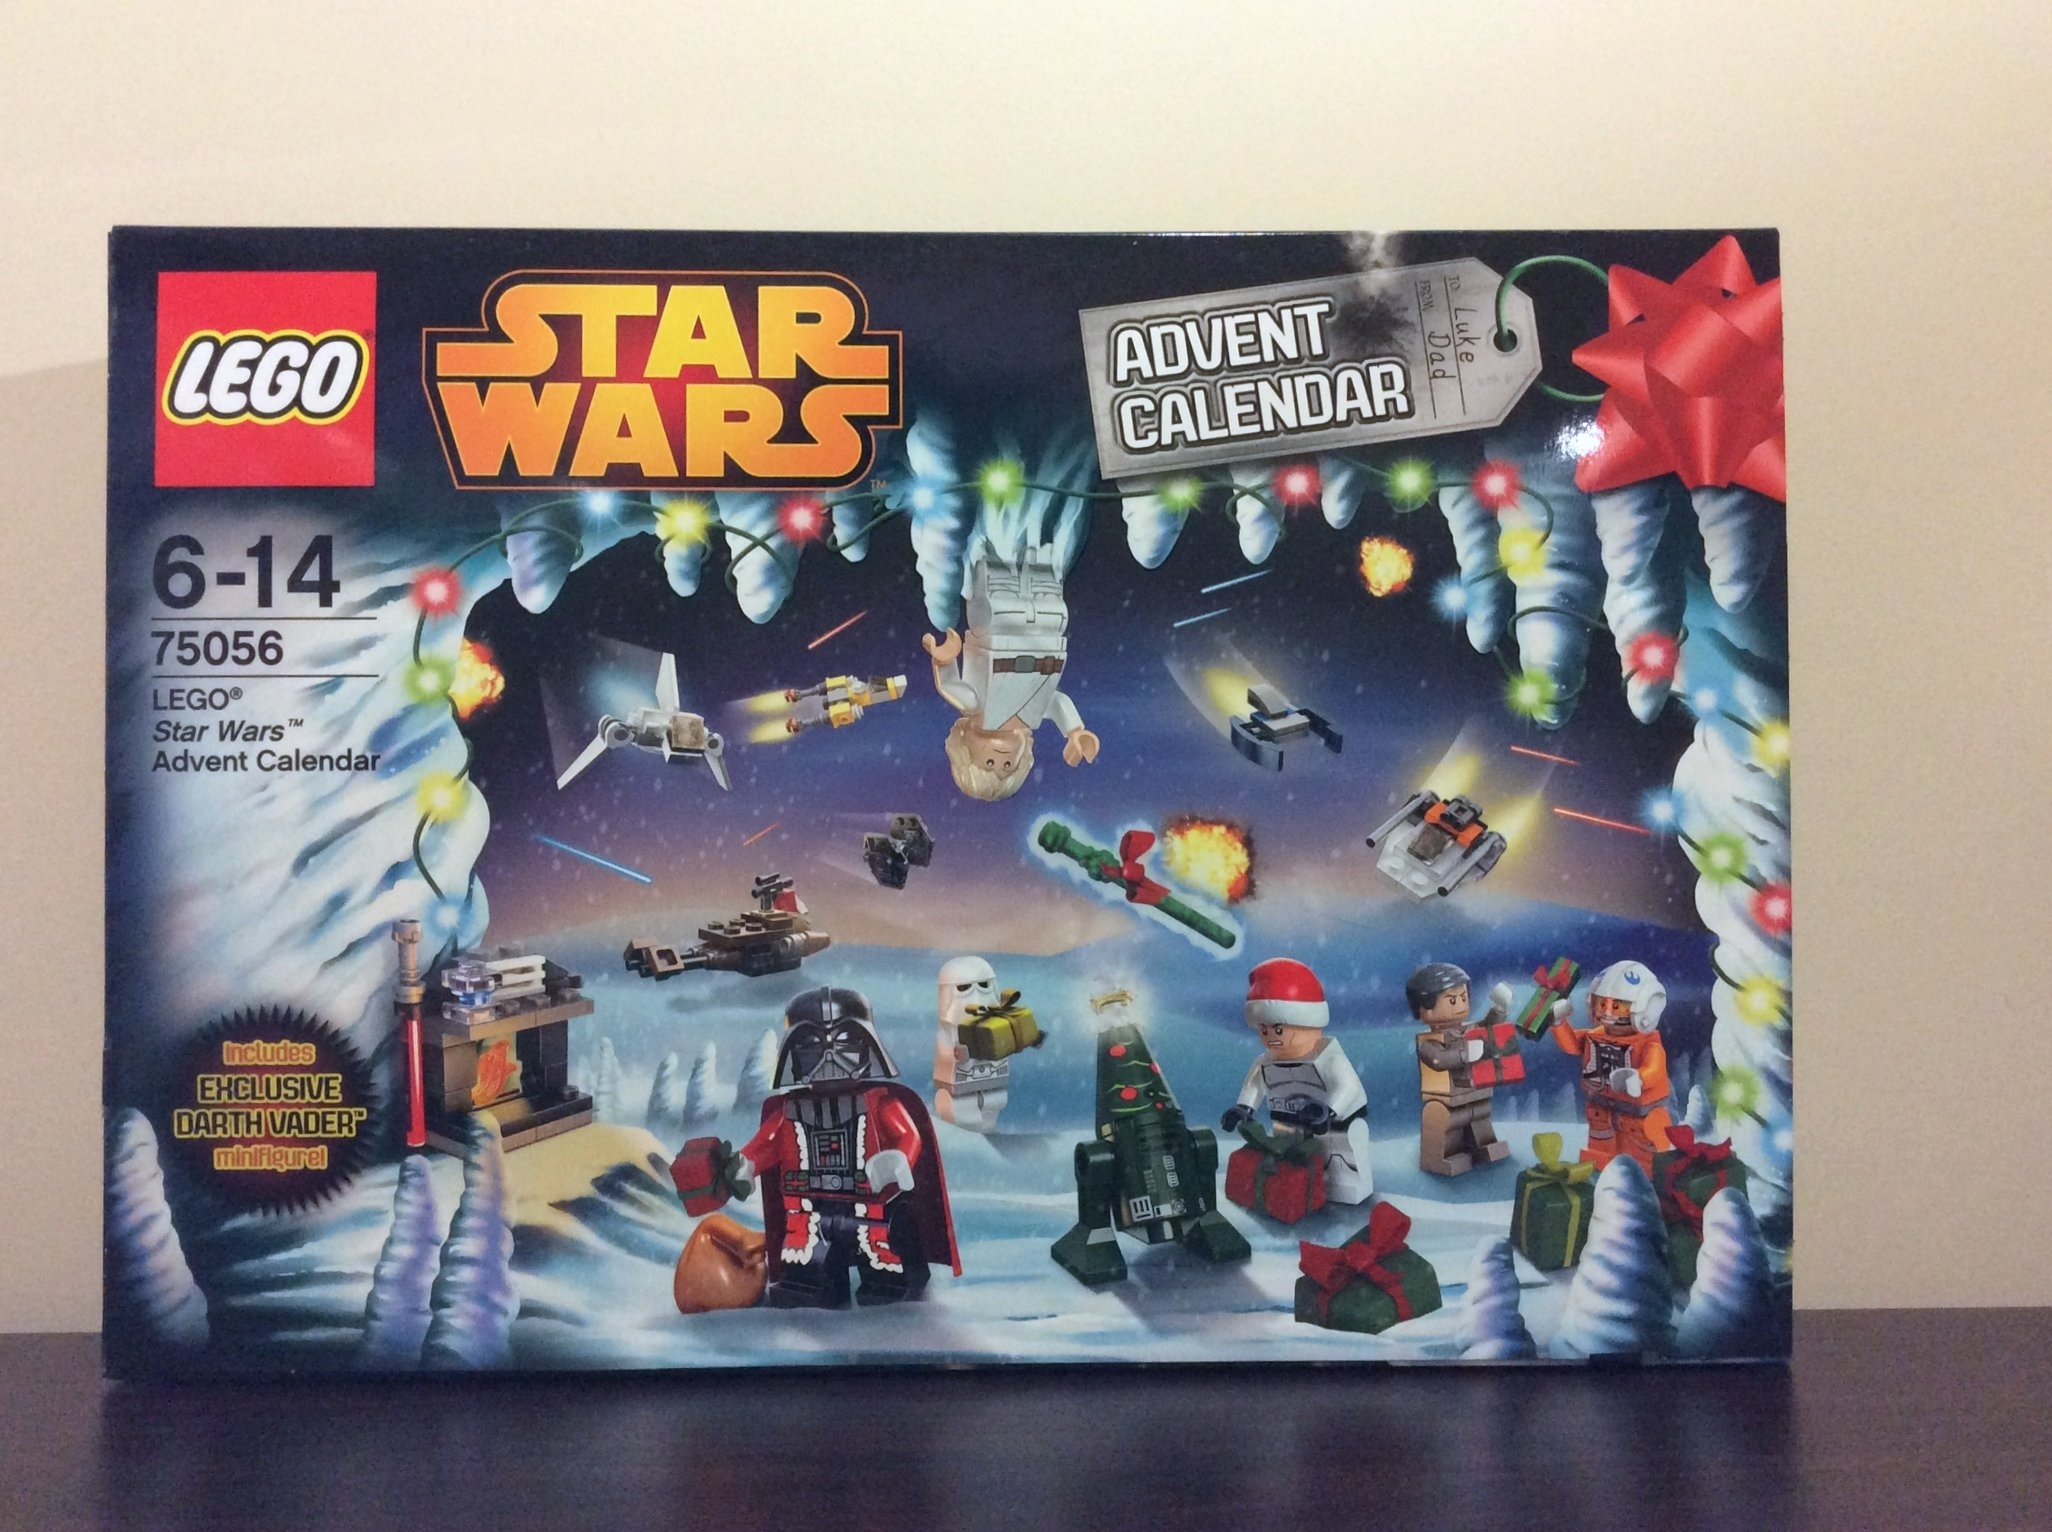 Take Lego Star Wars Advent Calendar 2021 Instructions